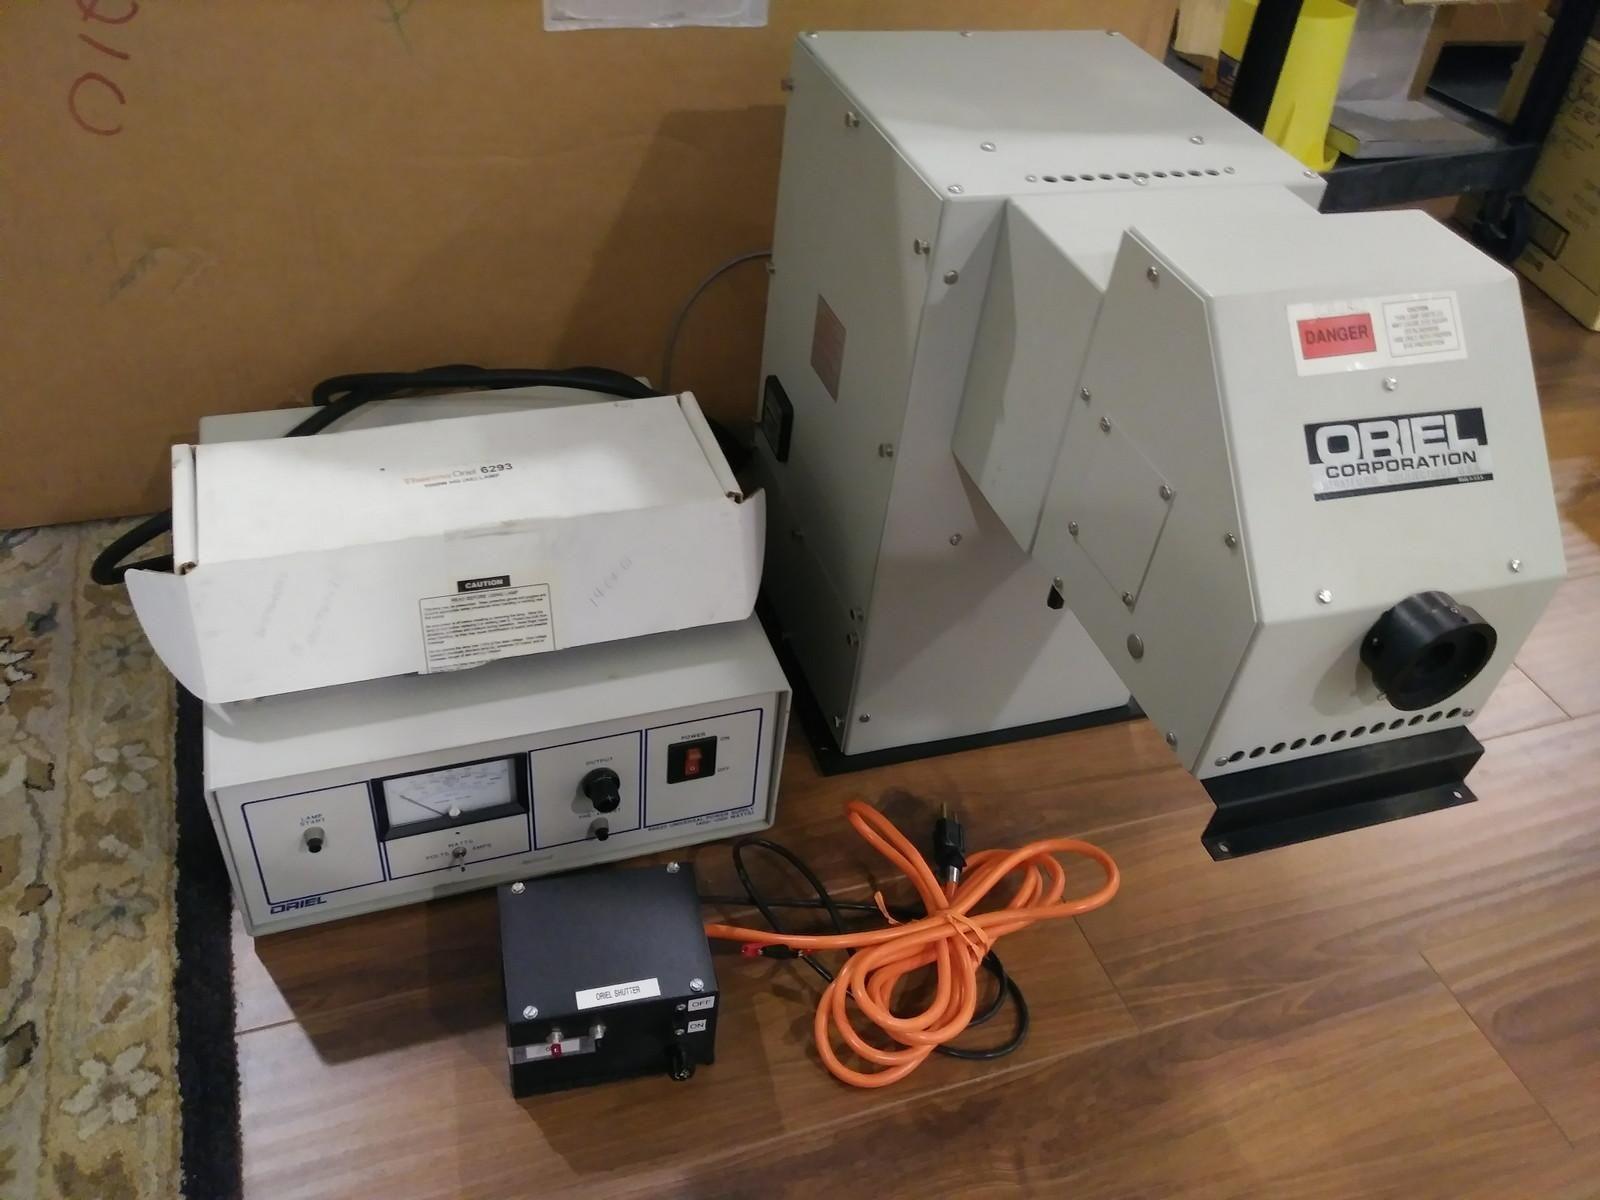 Newport Oriel Solar Simulator 82410 + 2 Lamps + 1kW Power Supply 68820